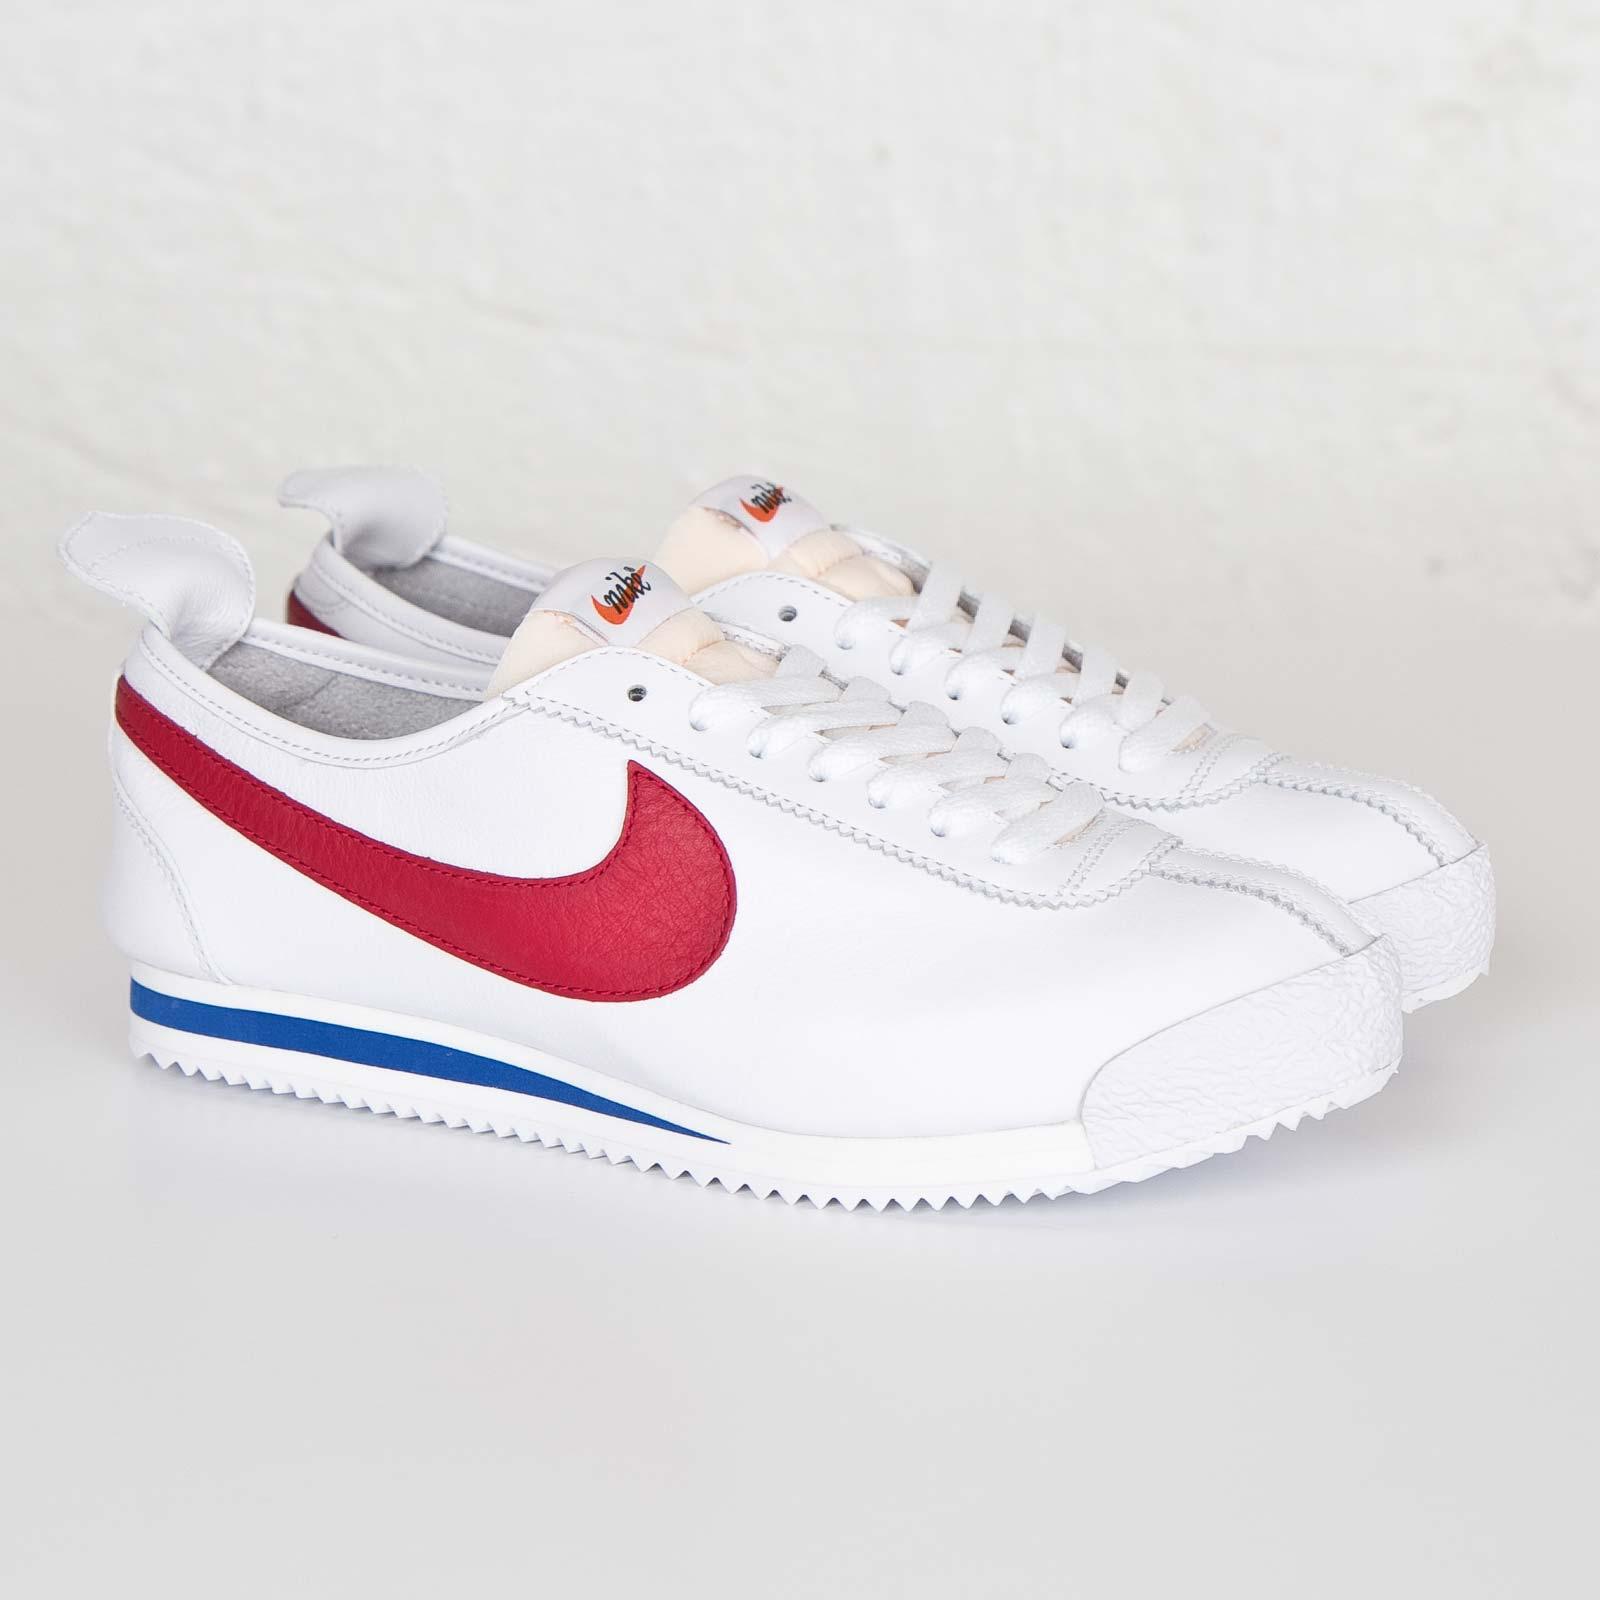 Nike Cortez 72 SP 813031 813031 SP 164 Sneakersnstuff   Sneaker ... 8cefae